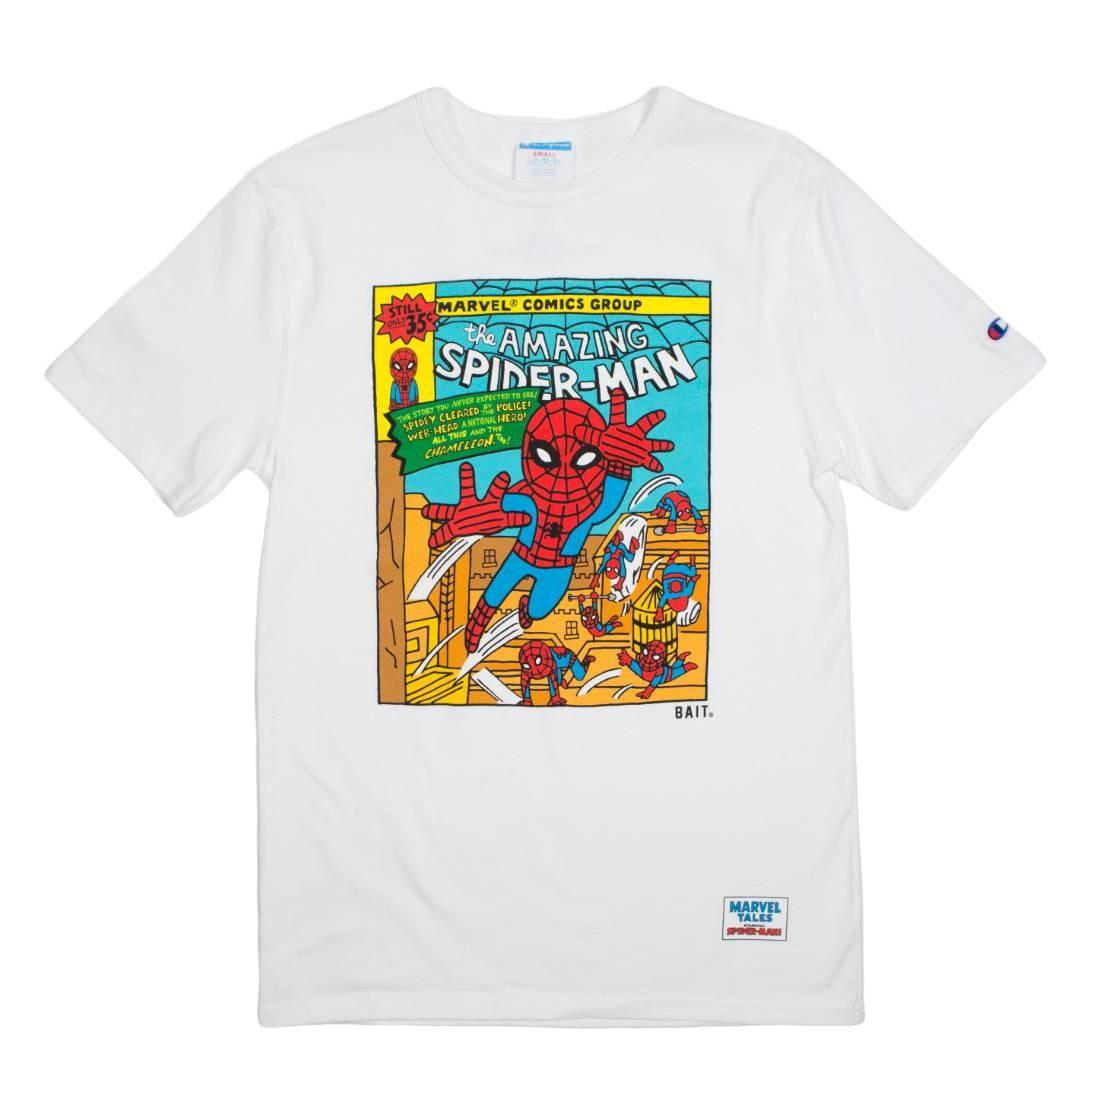 BAIT x Spiderman x Champion Men Spiderman Comic Tee (white)